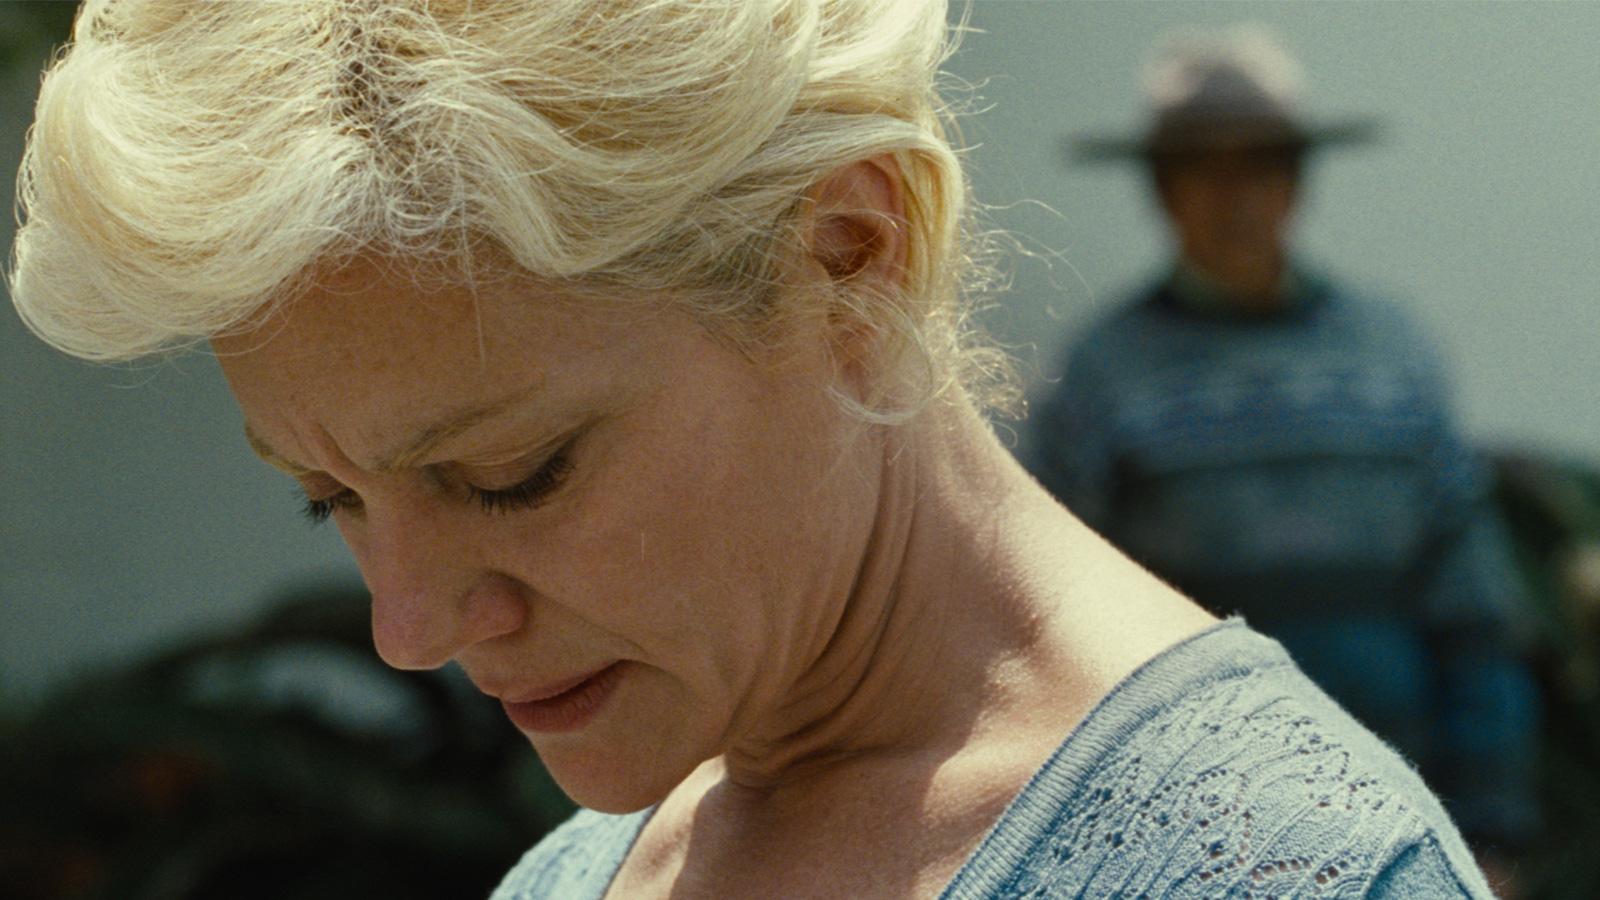 New York Film Festival 2008: The Headless Woman and Tony Manero